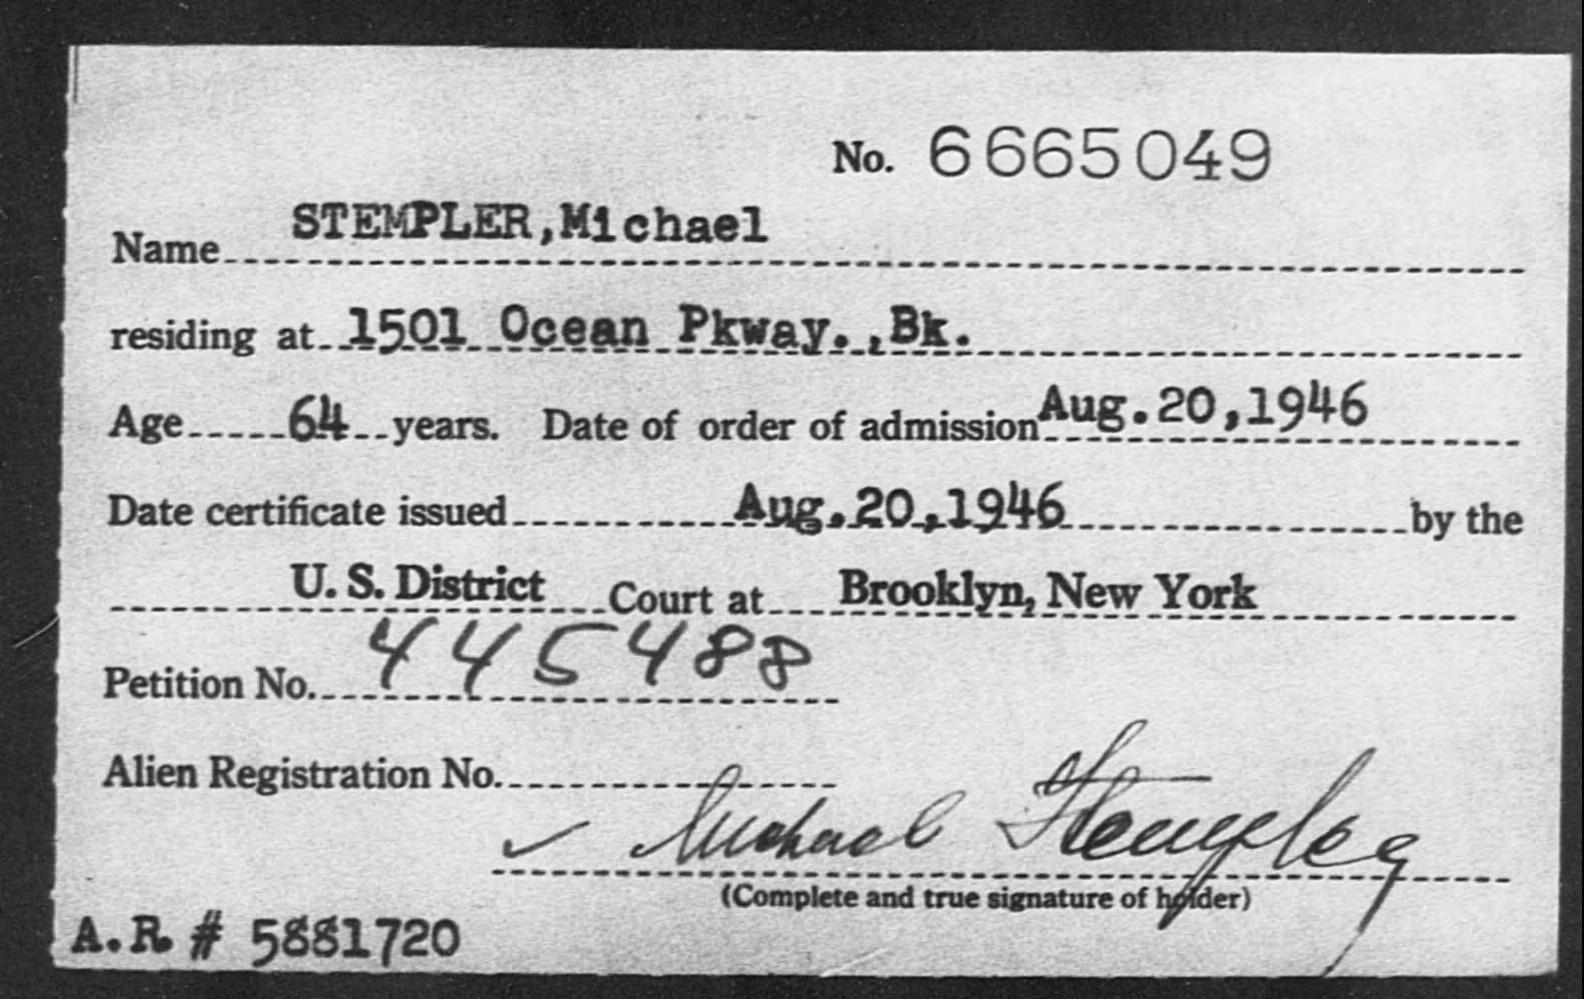 STEMPLER, Michael - Born: [BLANK], Naturalized: 1946